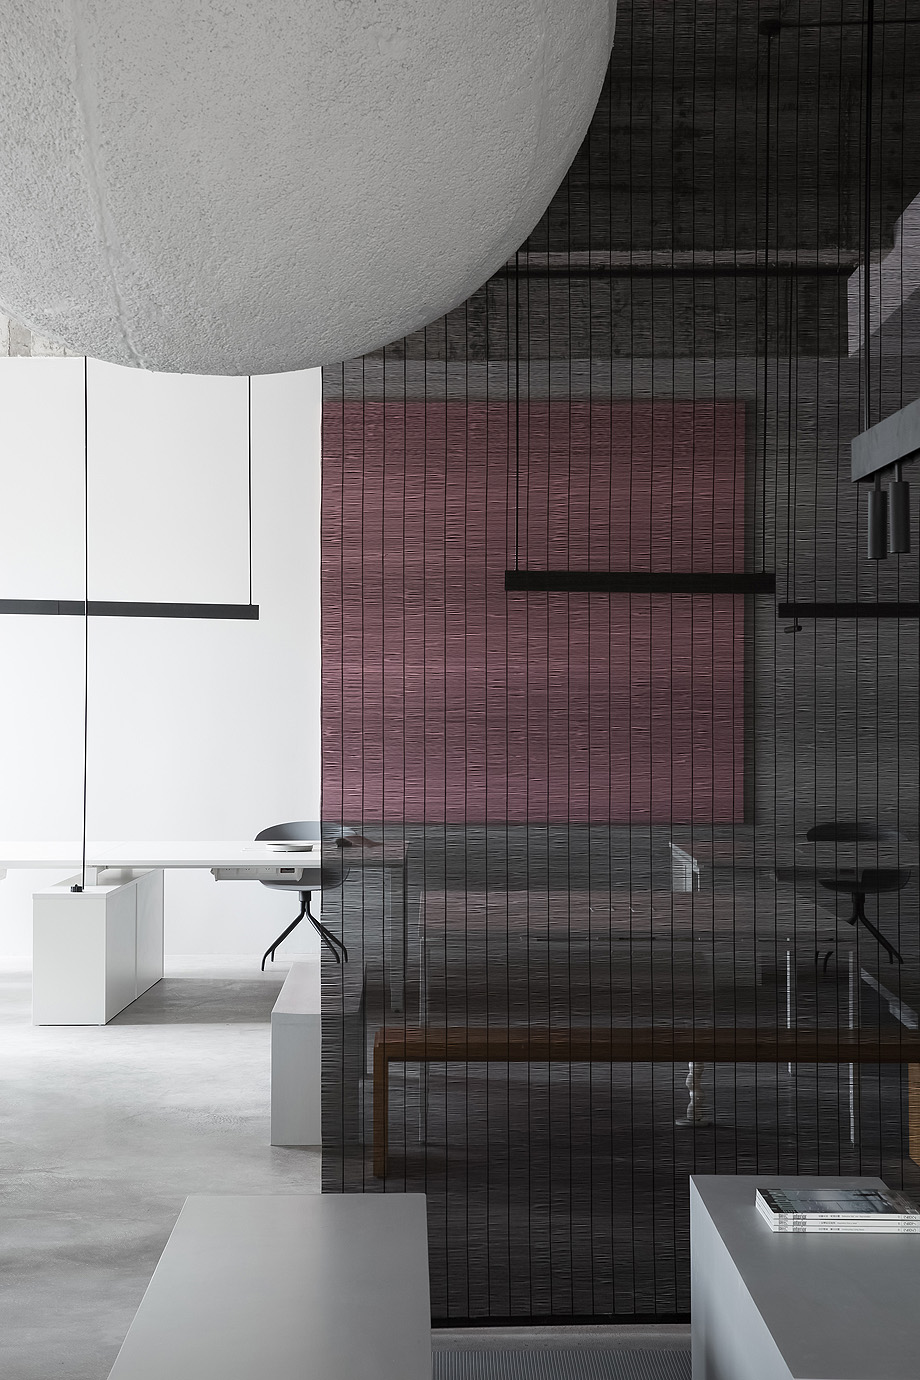 oficinas xzone de ad architecture - foto ouyang yun (12)